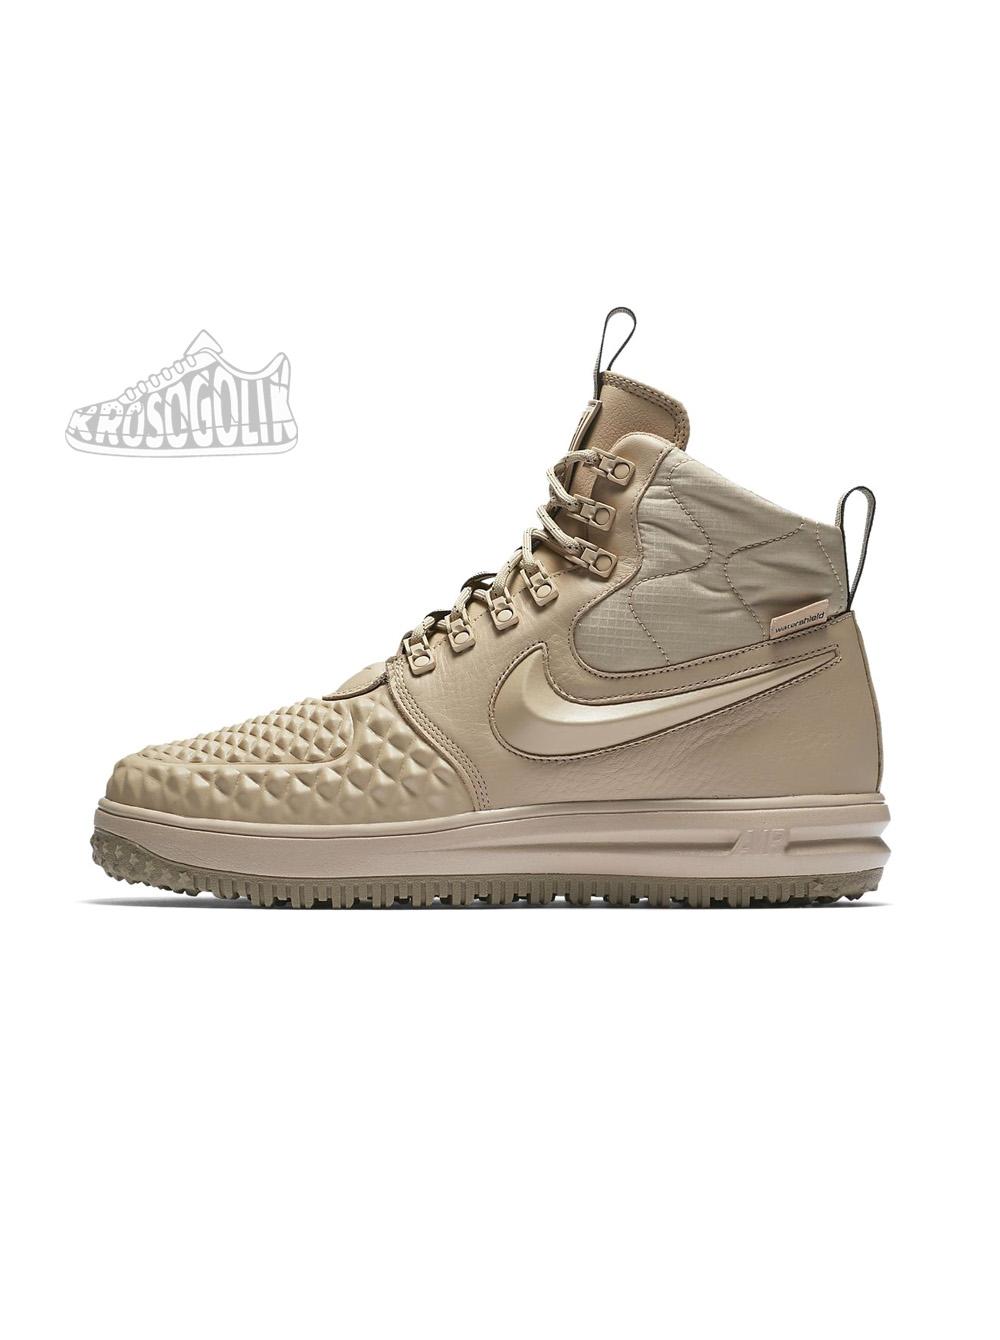 03979ad8 Купить мужские кроссовки Nike Lunar Force 1 Duckboot '17 Linen на ...